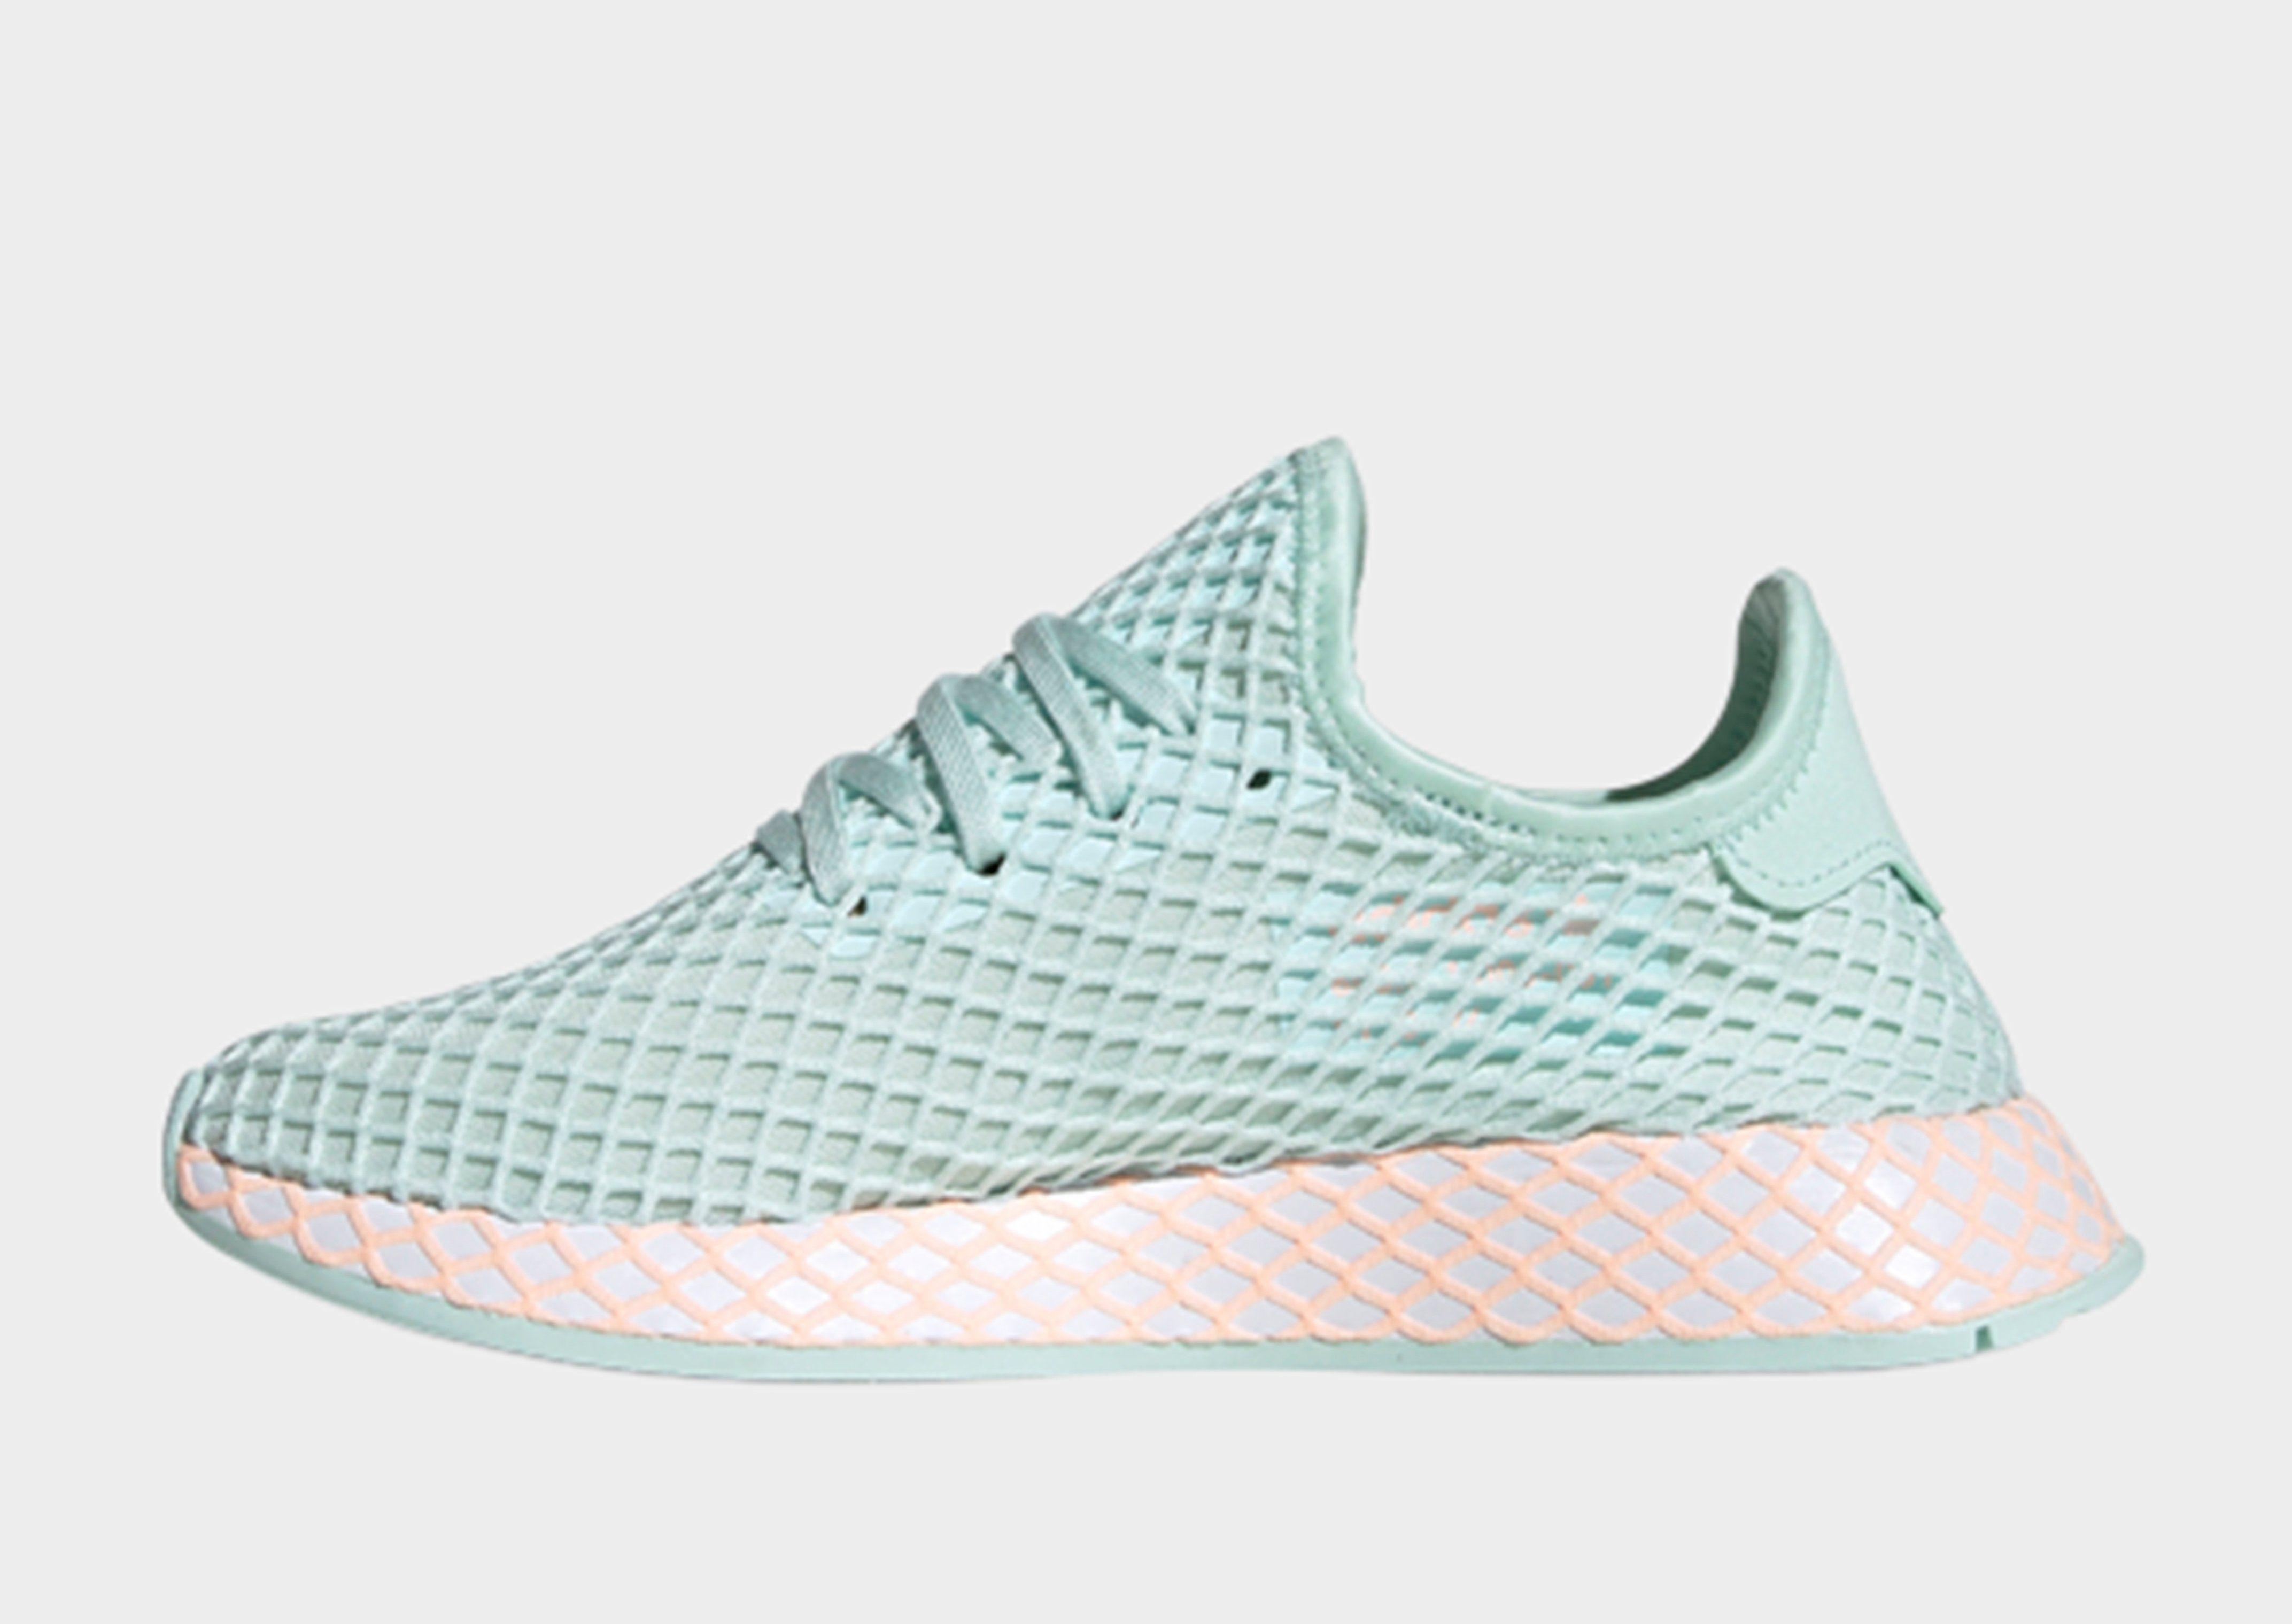 huge selection of 428c0 3a191 ADIDAS Deerupt Runner Shoes  JD Sports